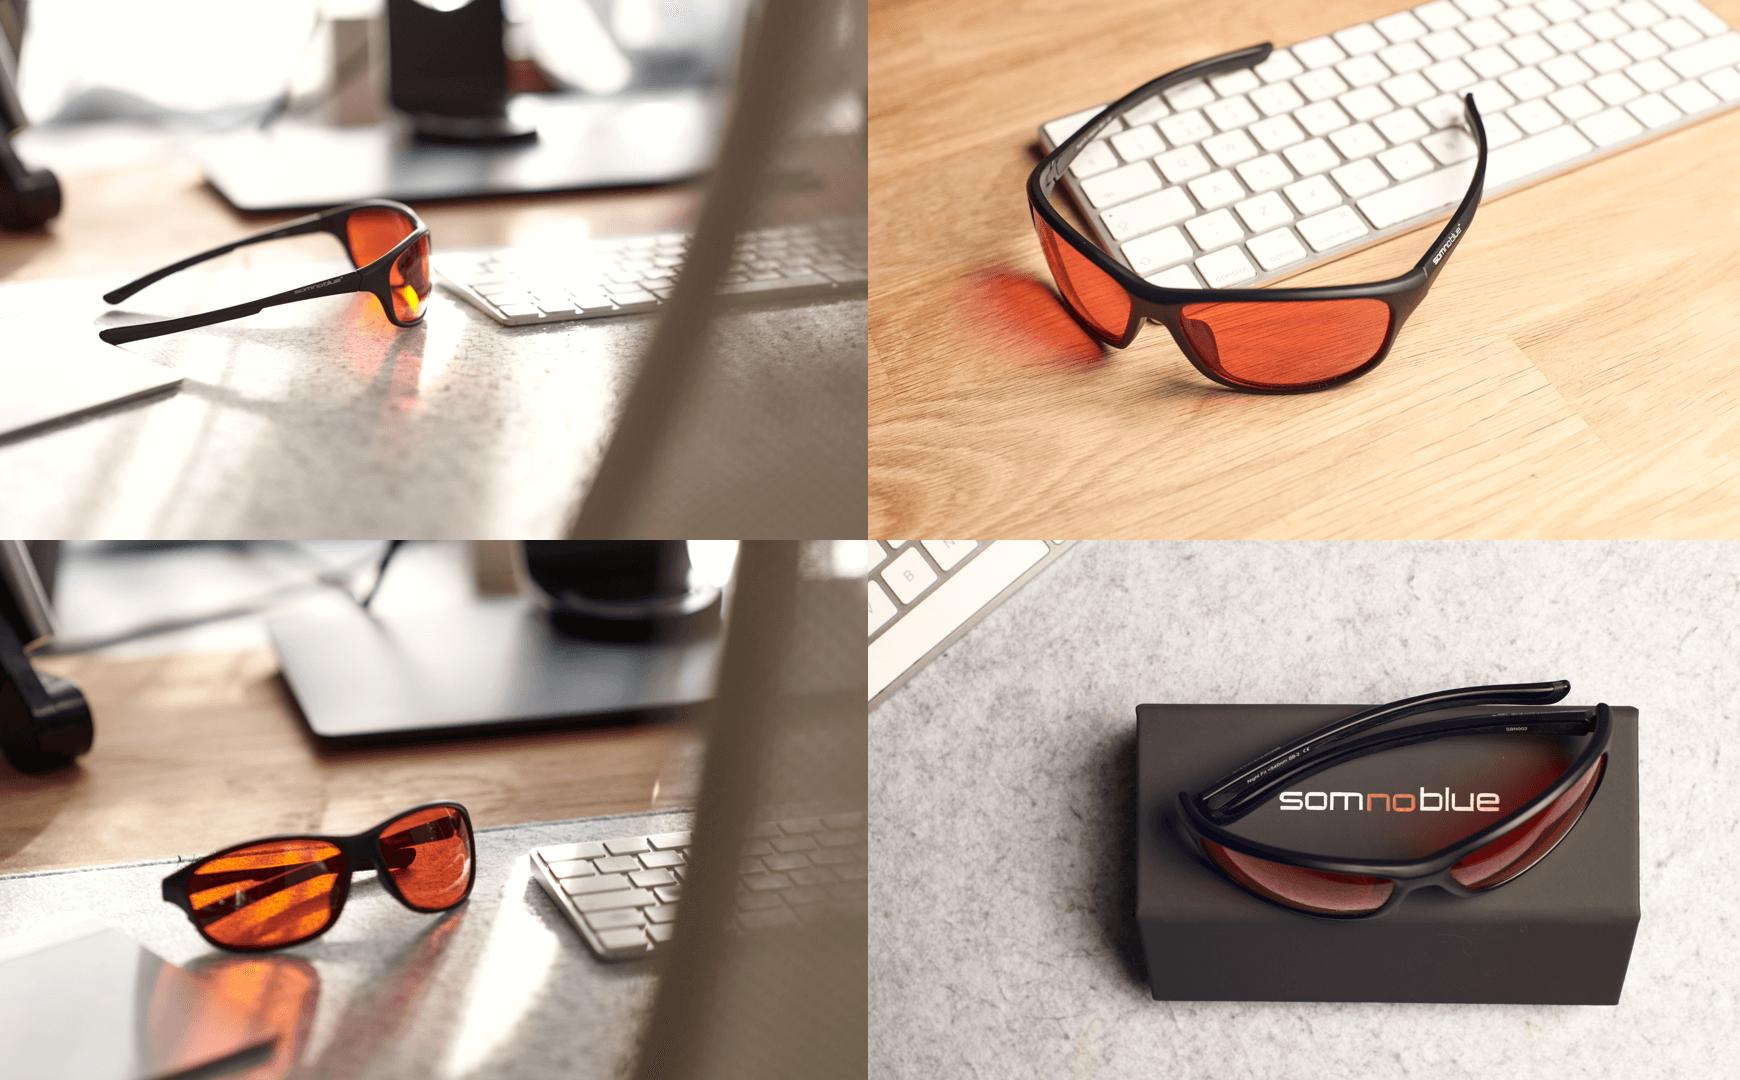 Somnoblue blue light blocking sleep glasses SB-3 PLus - Copy